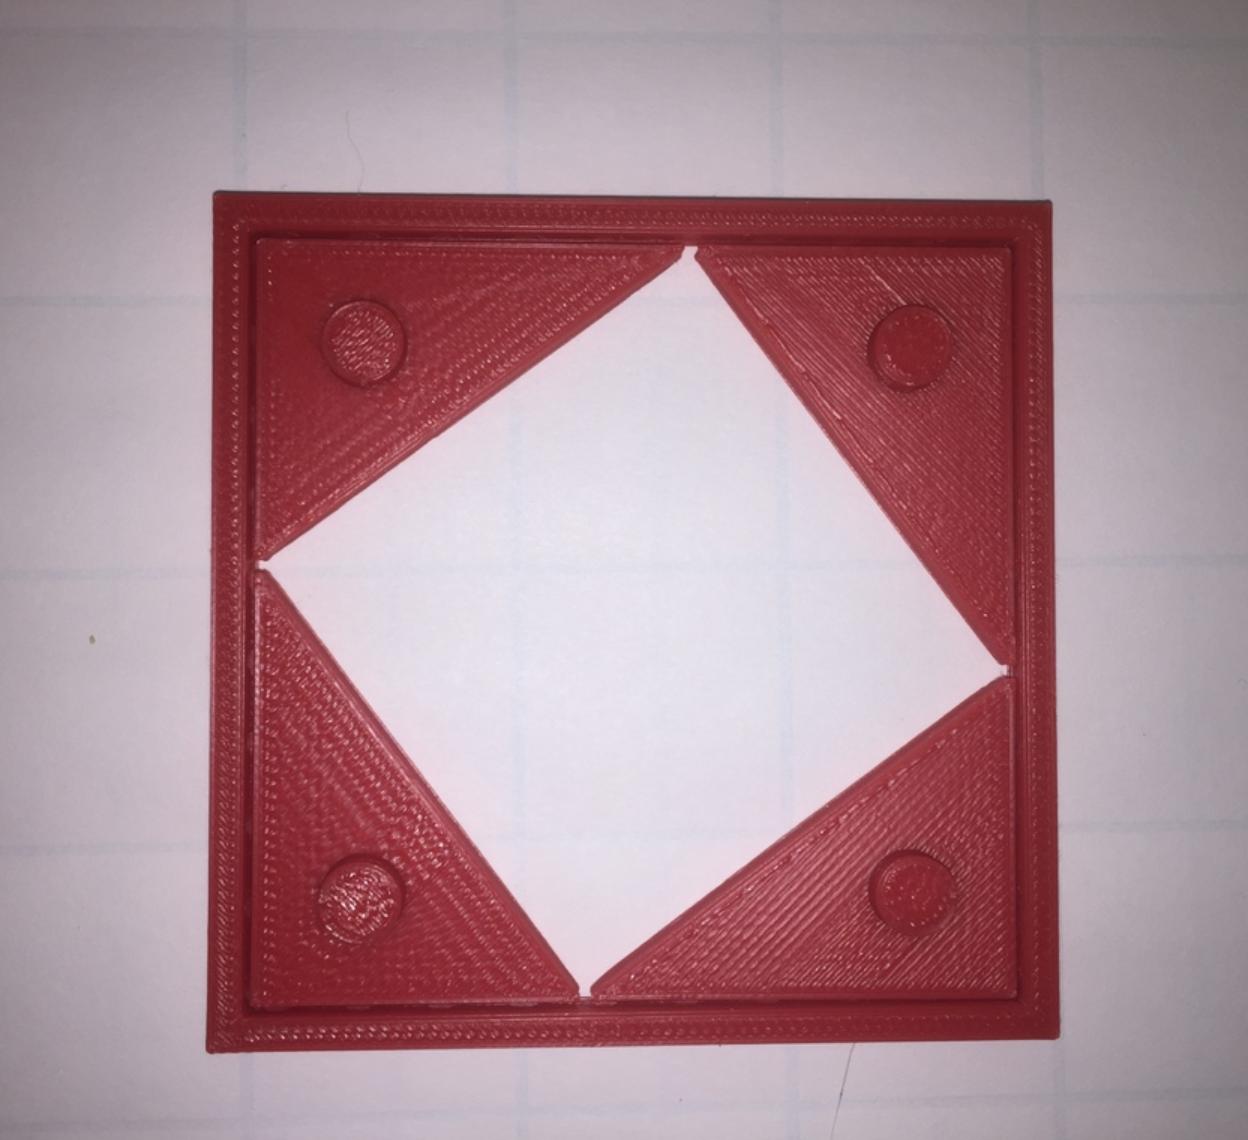 Capture d'écran 2017-12-26 à 15.09.16.png Download free STL file Pythagorean Theorem, Visual Proof, Chinese Origin • 3D printer template, LGBU